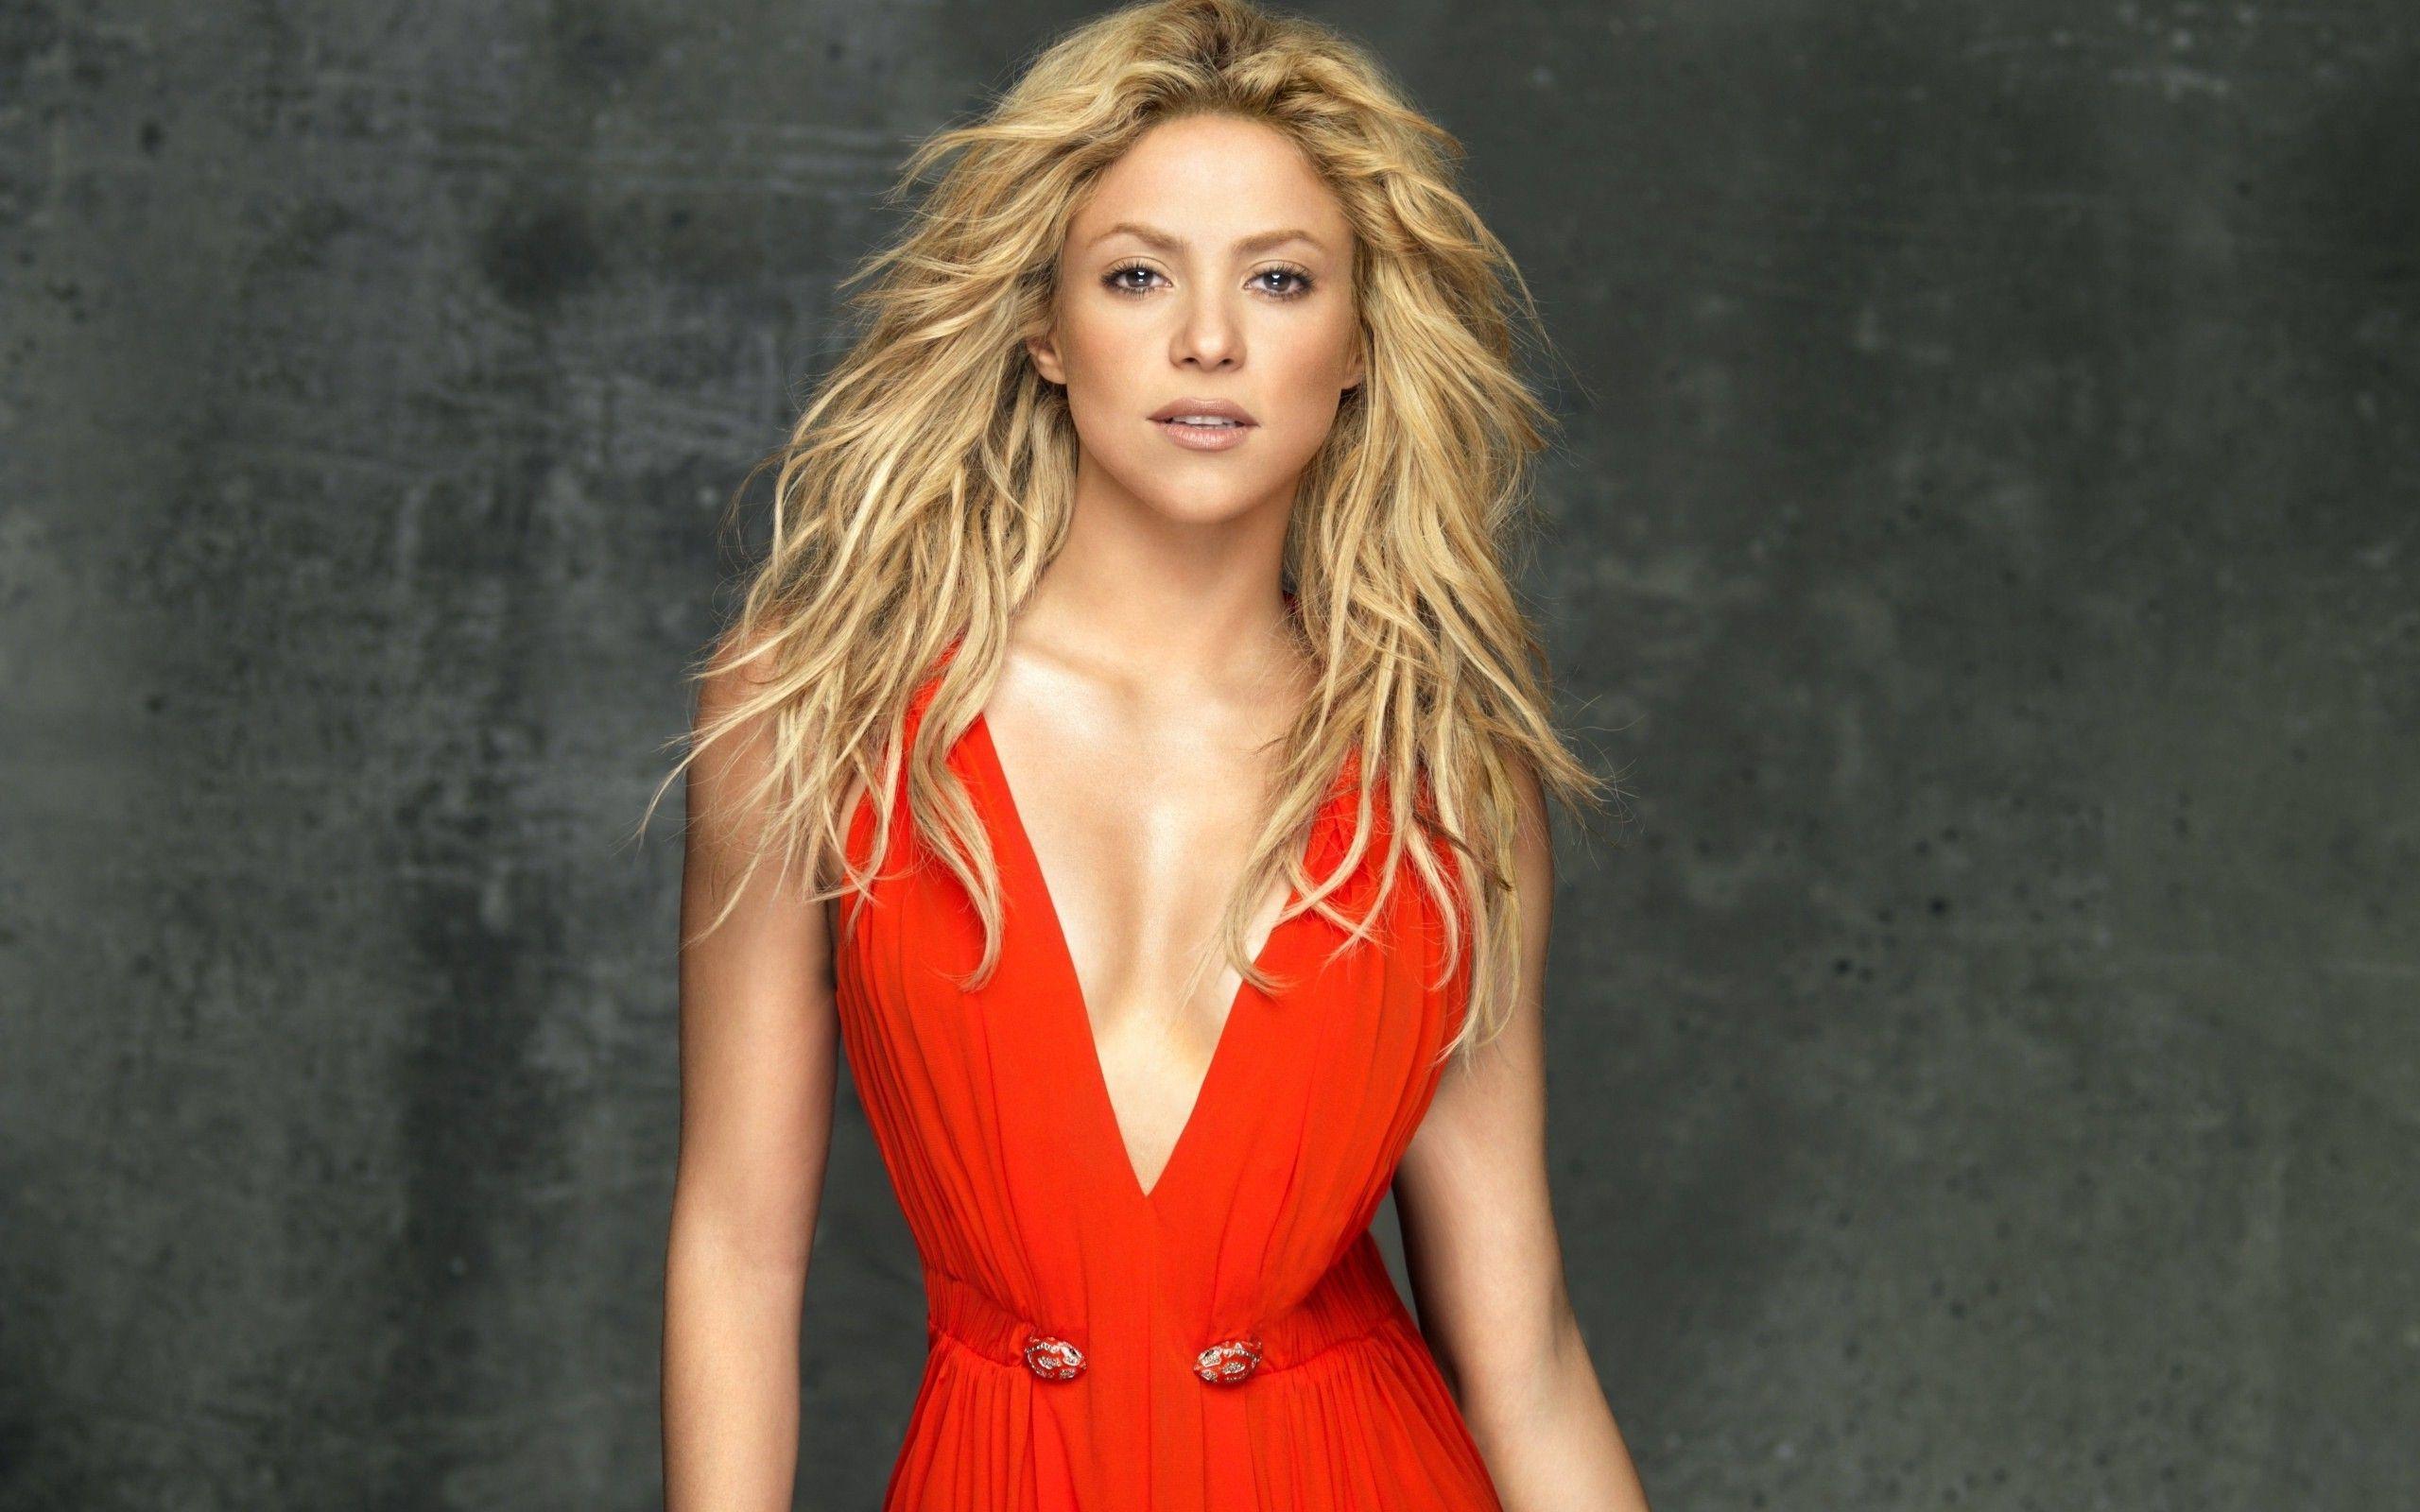 Pin By Junaid Adil On Body Shakira Hot Shakira Shakira Photos